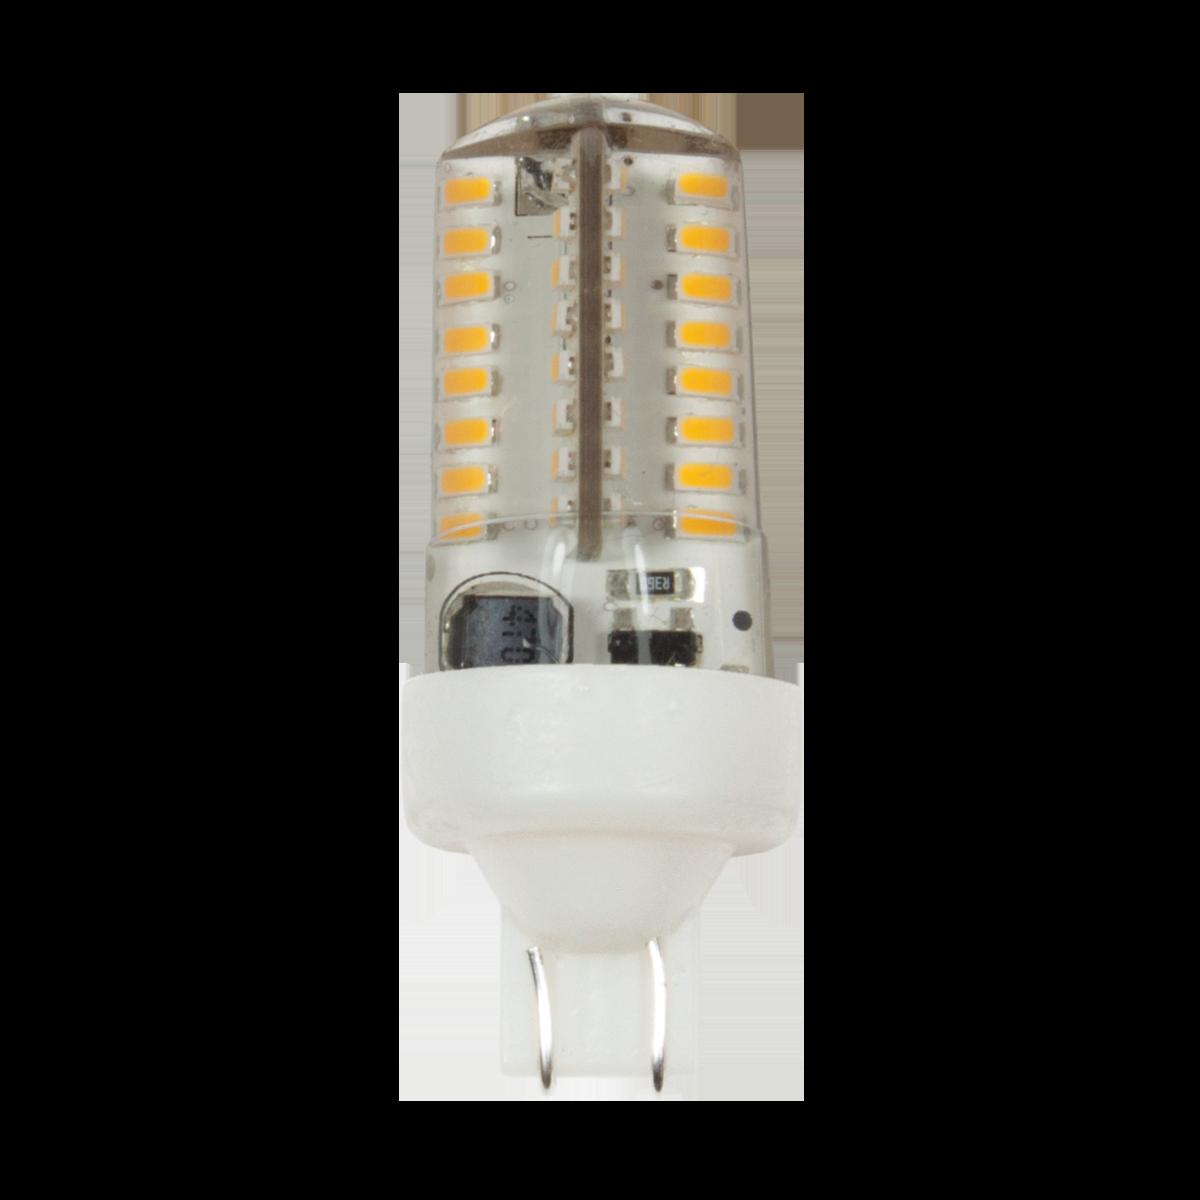 T5 ECOSTAR  Wattage: 3 Lumens: 240